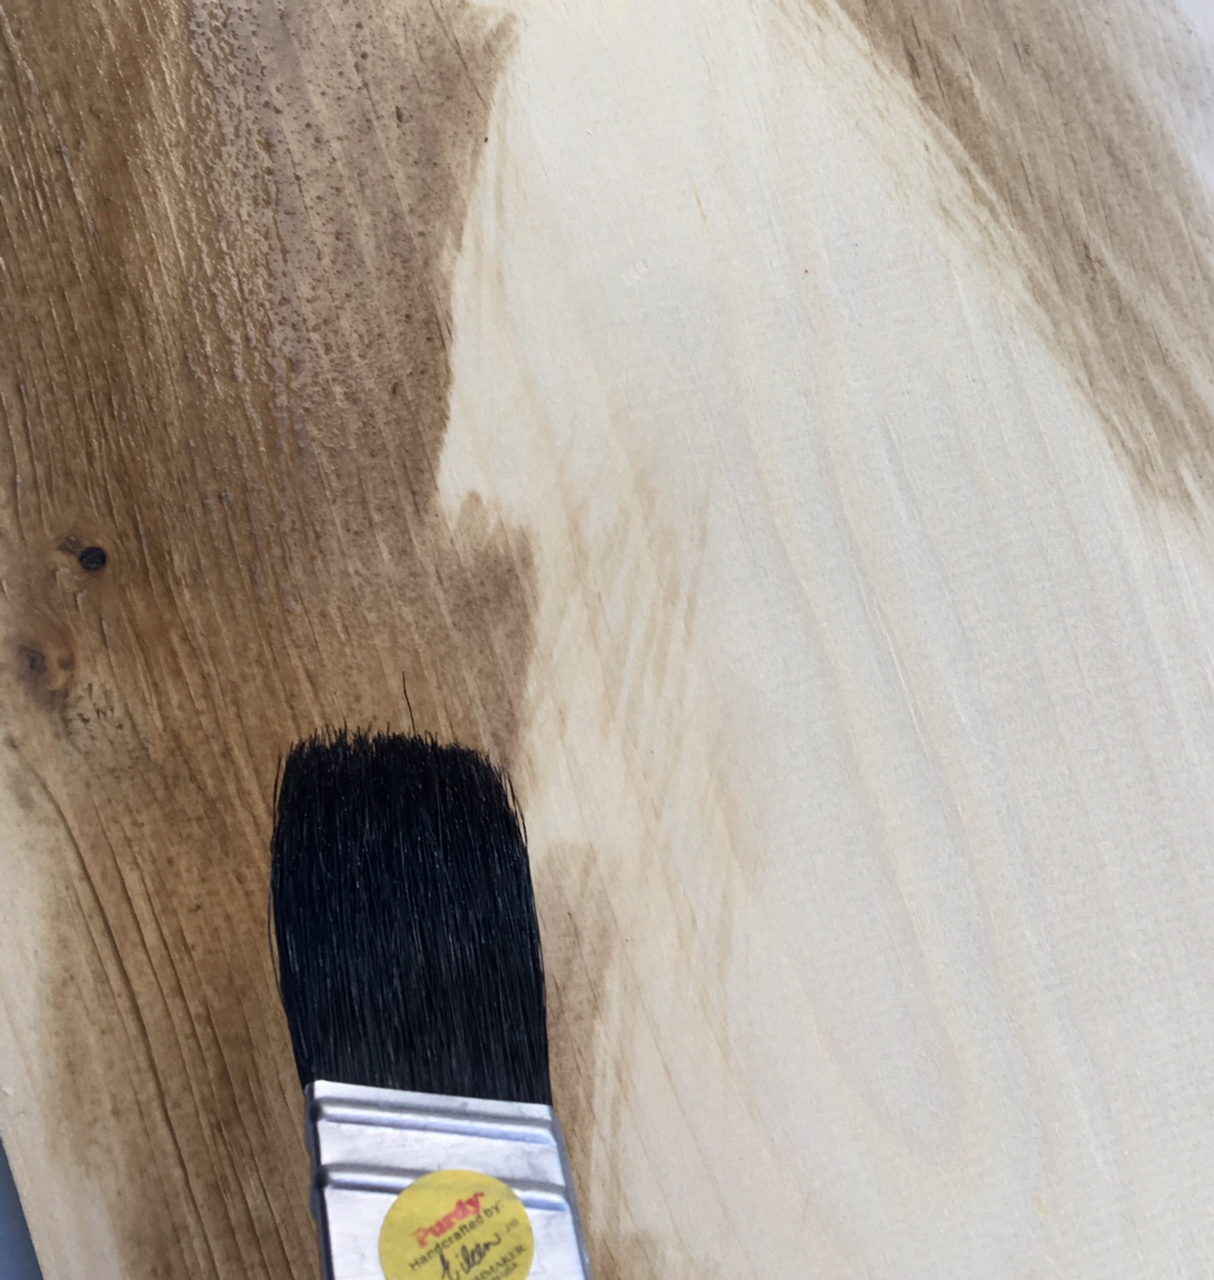 DIY-fawn-deer-print-wood-tray